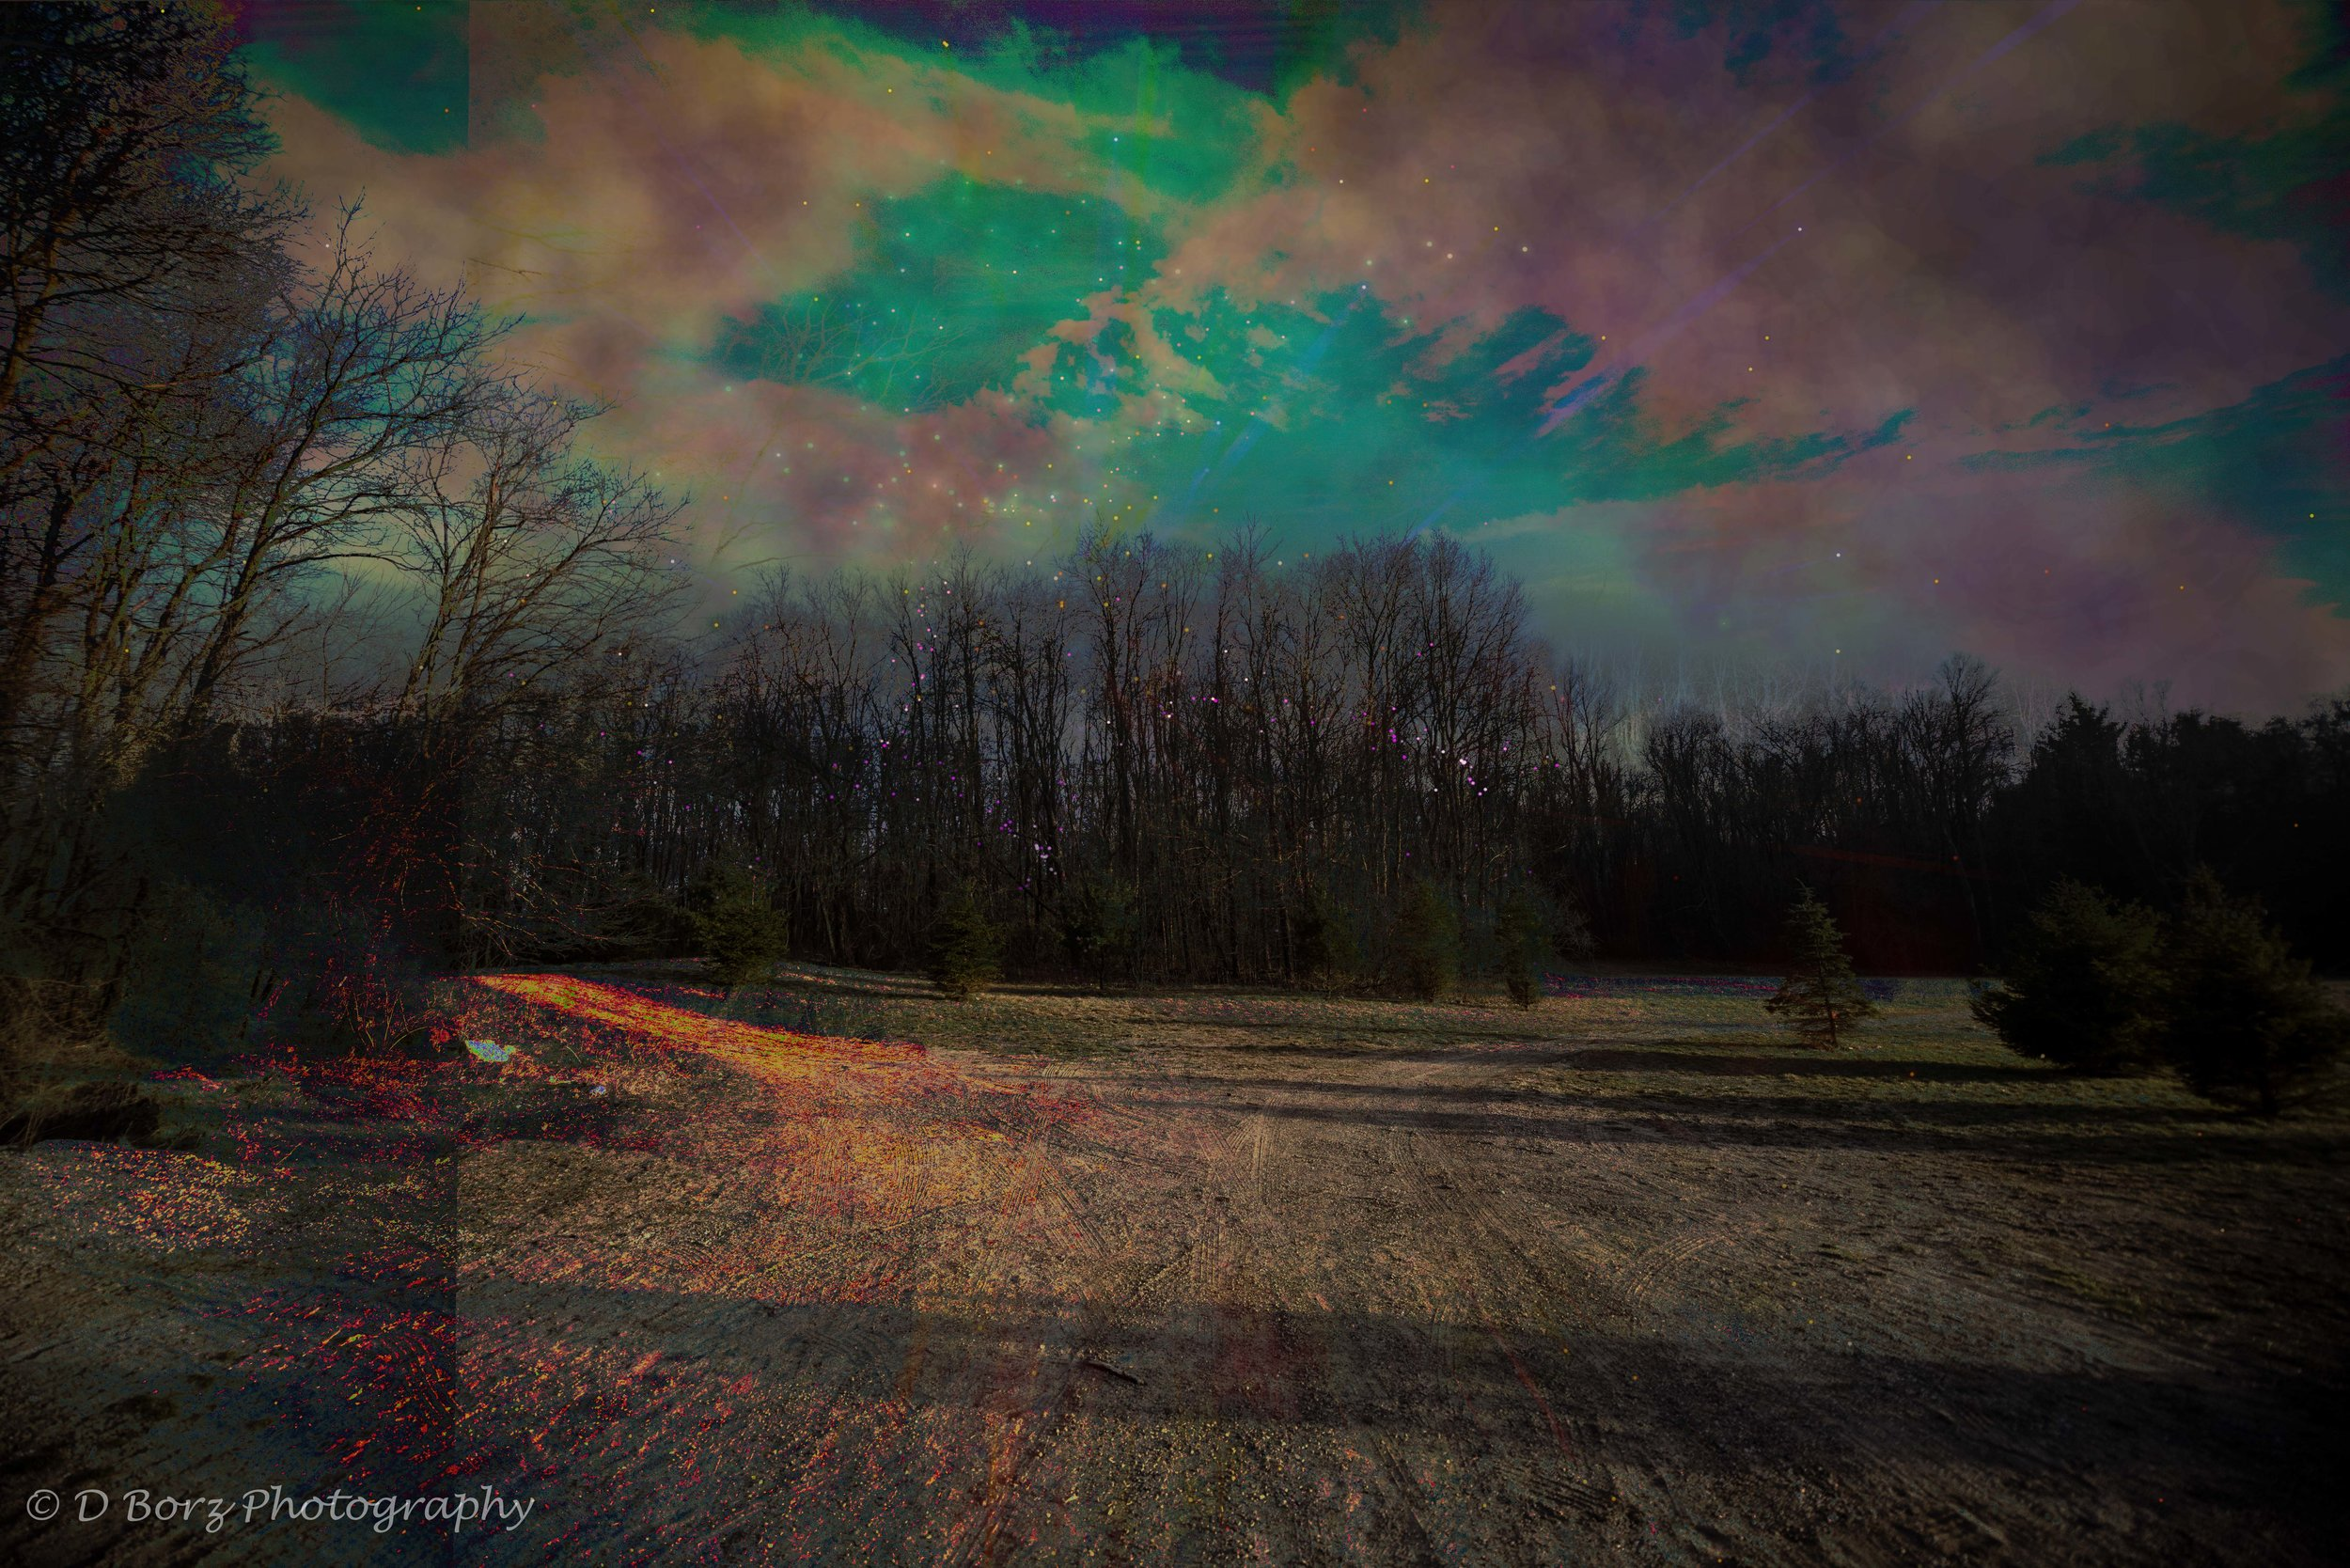 borzkowski_d_soundscape-14.jpg